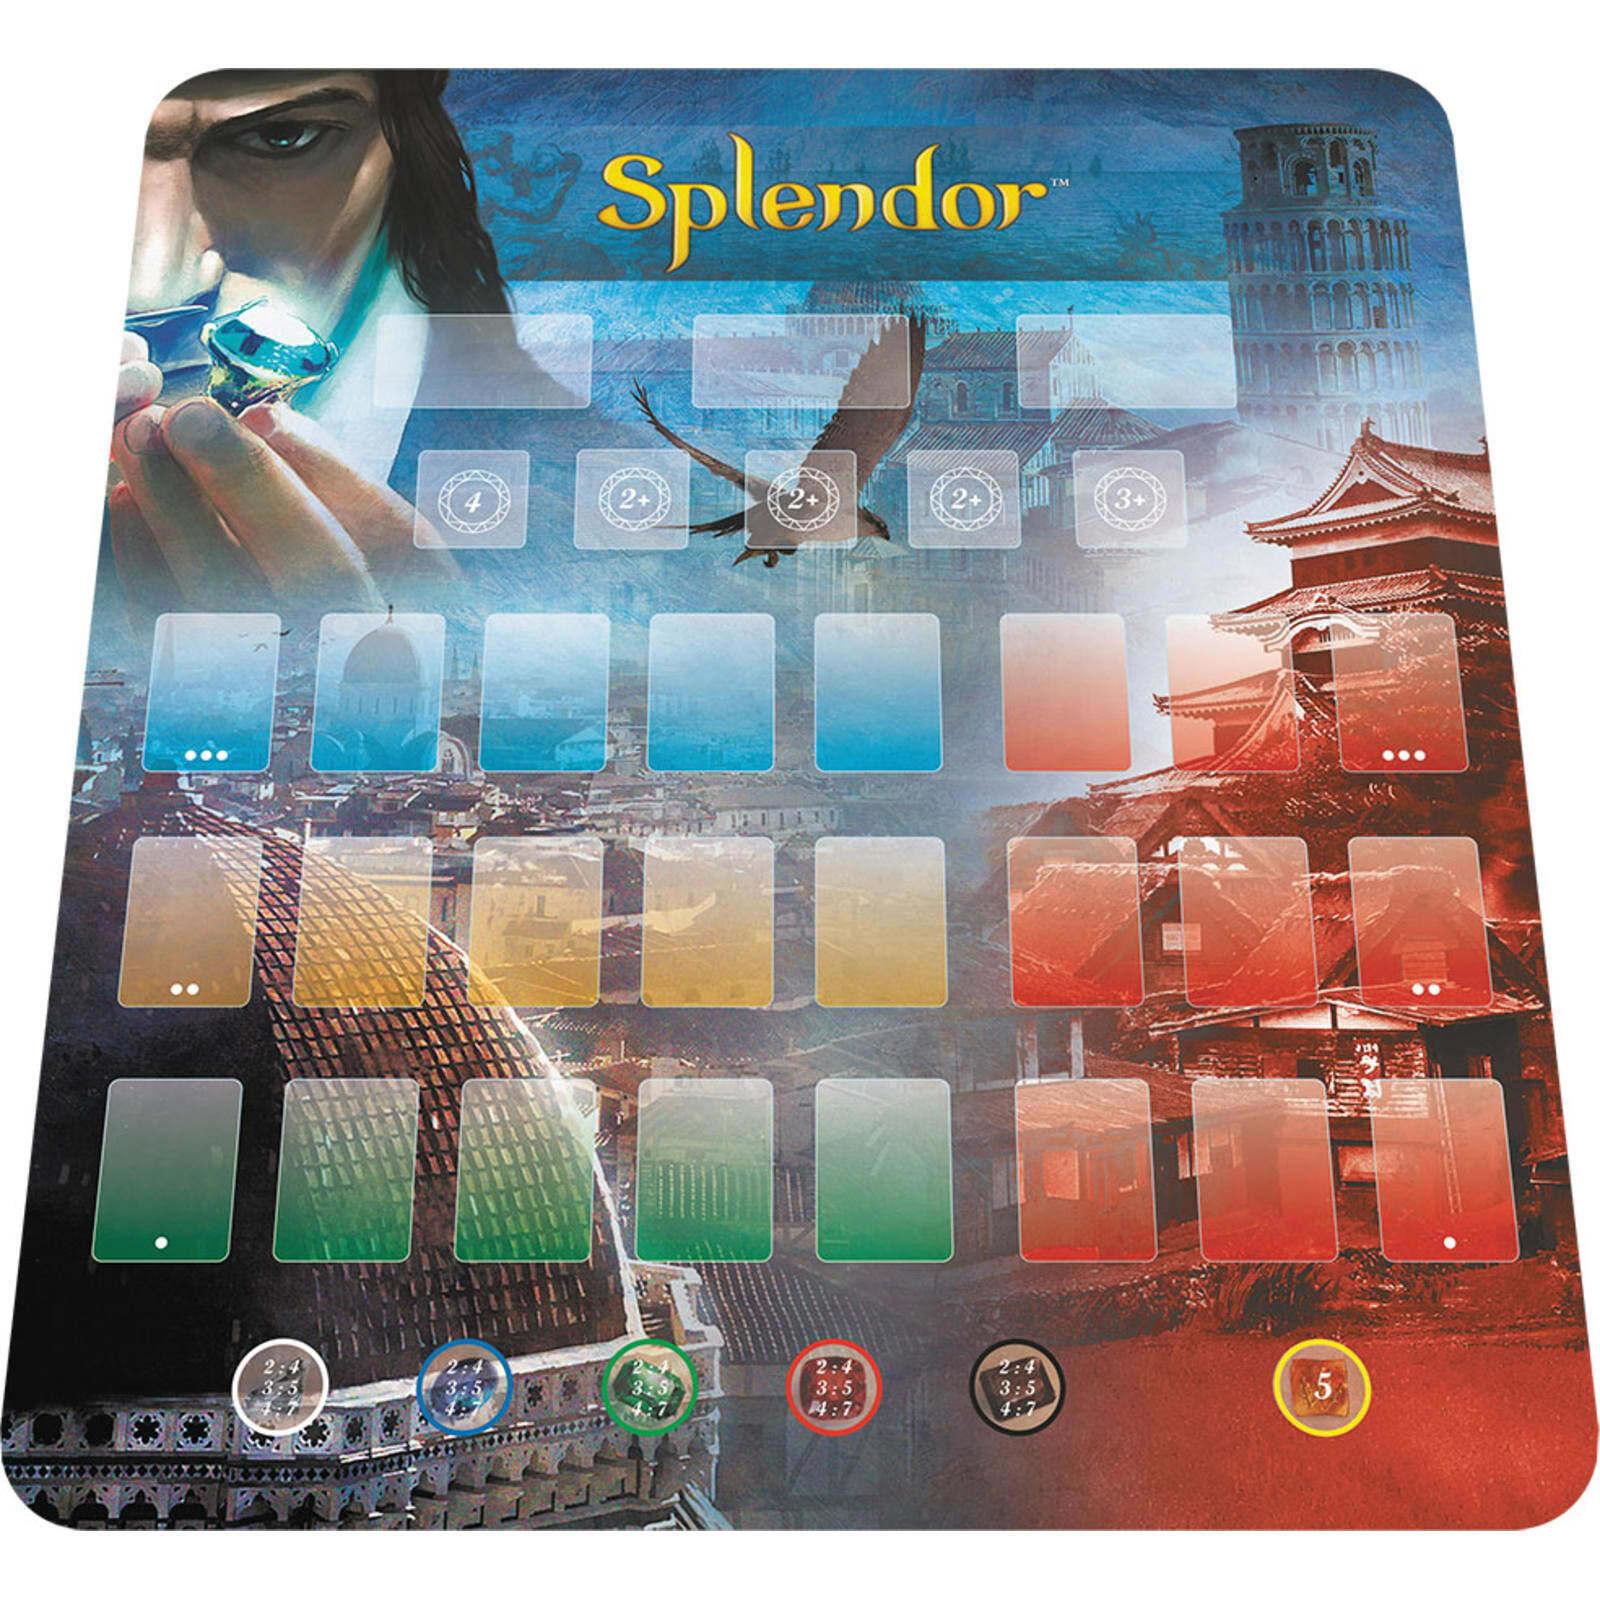 Splendor Playmat game mat New edition